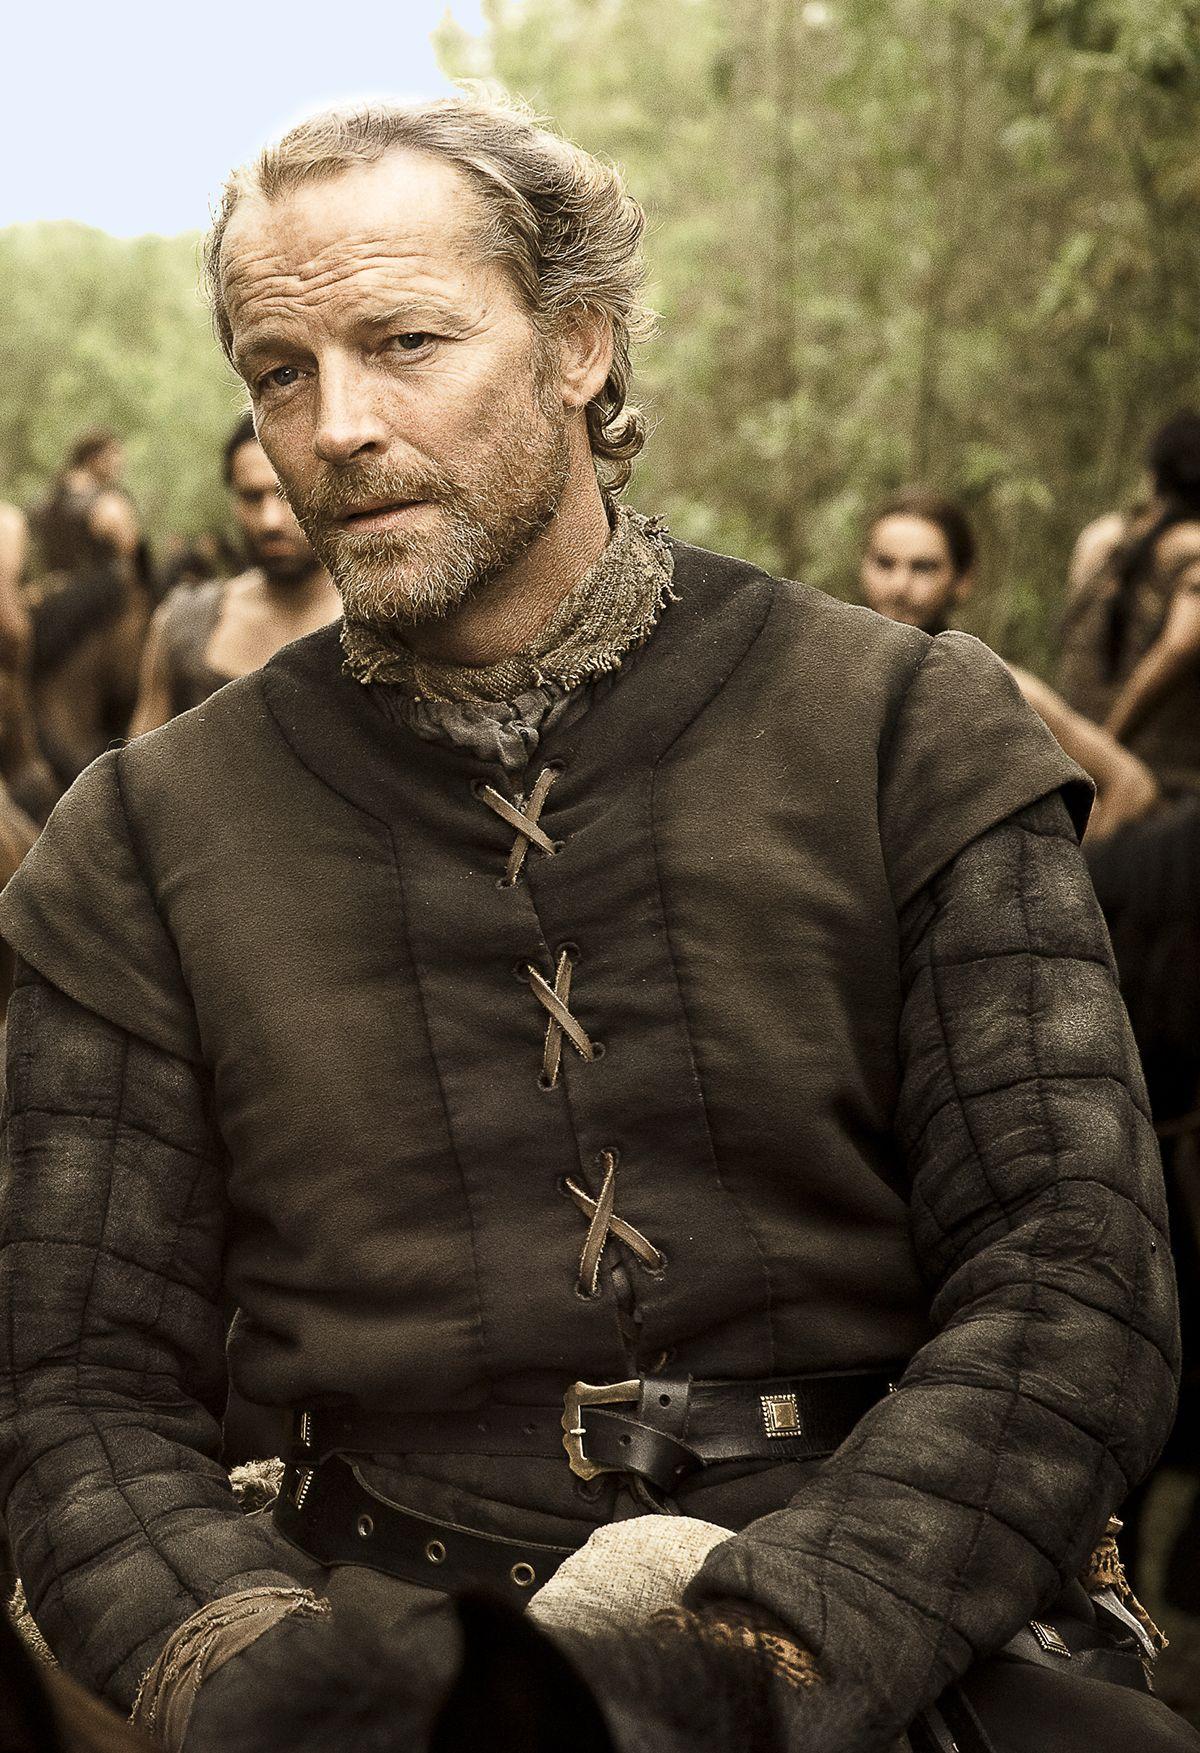 Game of Thrones star defends season 8's longer episodes